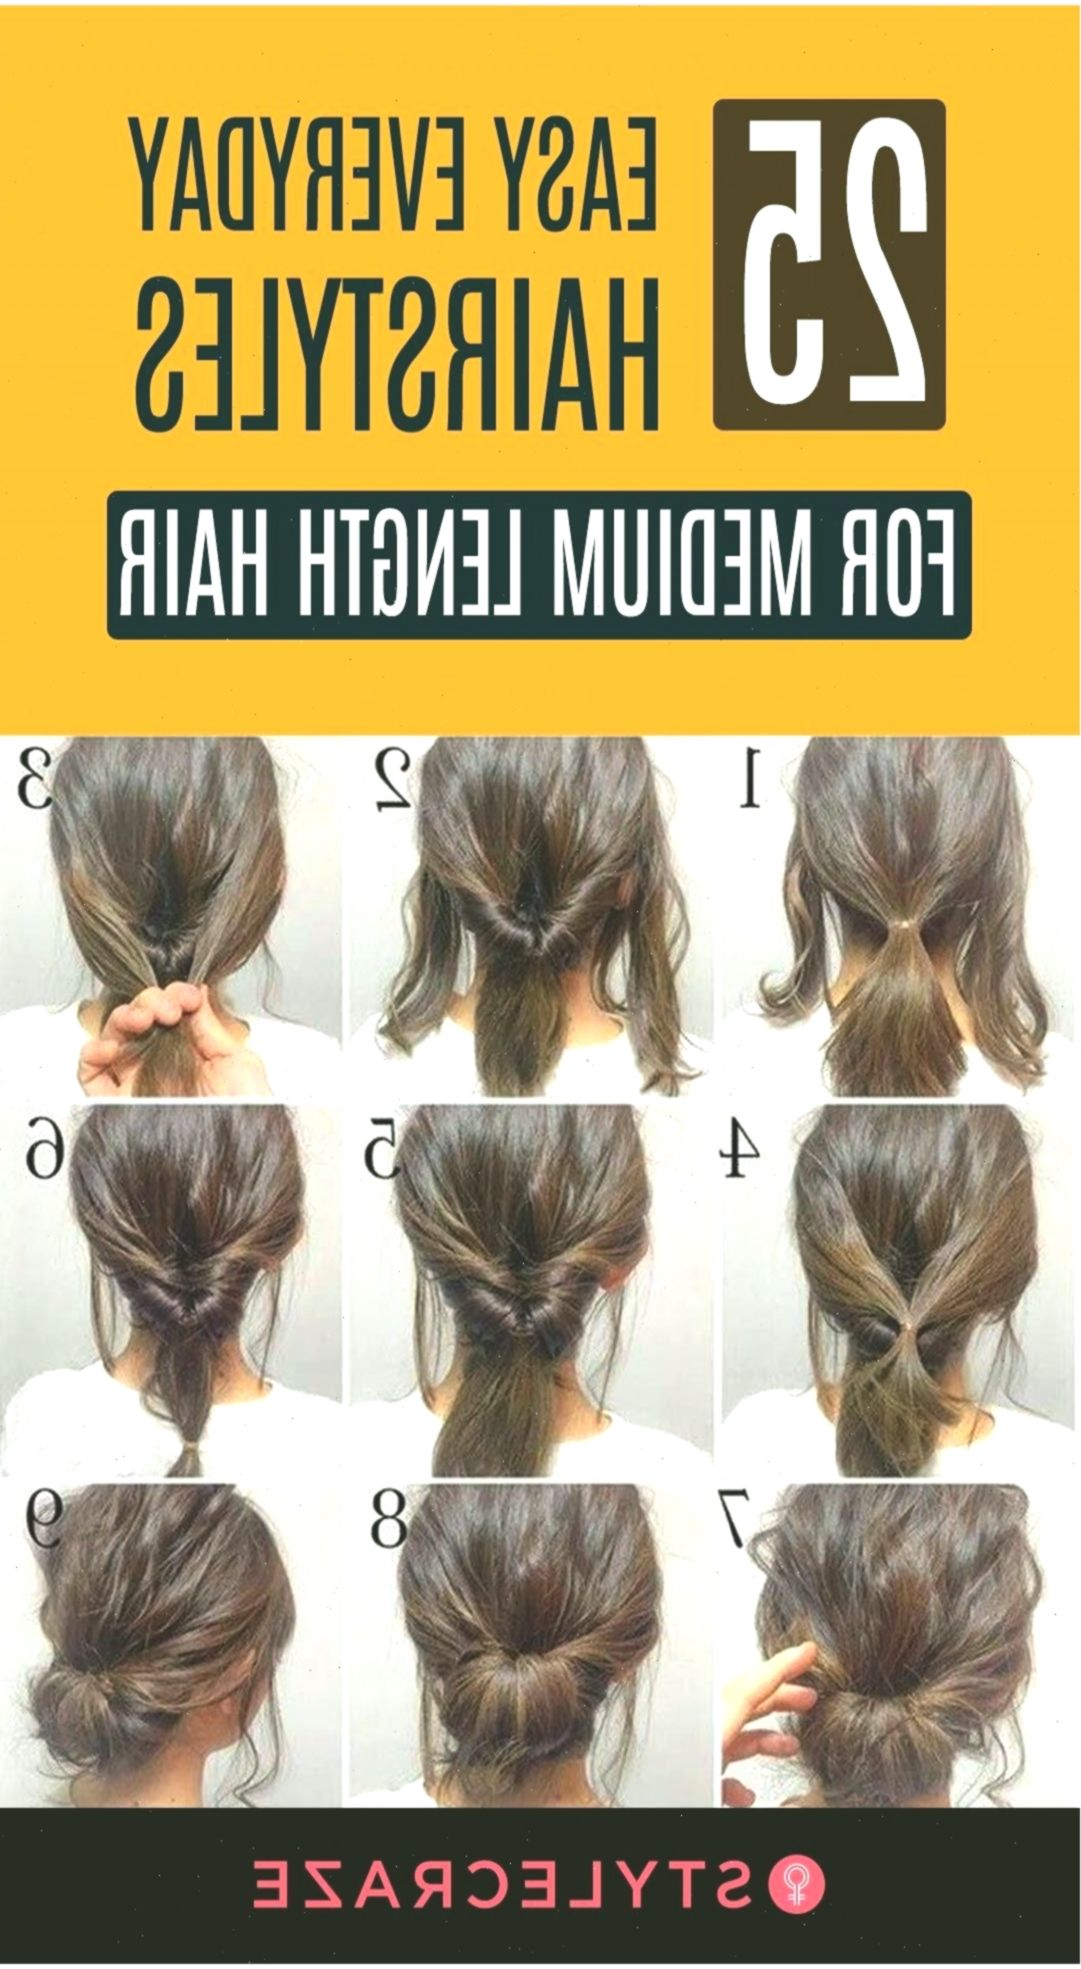 25 Easy Everyday Hairstyles For Medium Length Hair Hairstyles Women Hairstyle Frisur Easy Everyday Hairstyles Medium Length Hair Styles Everyday Hairstyles